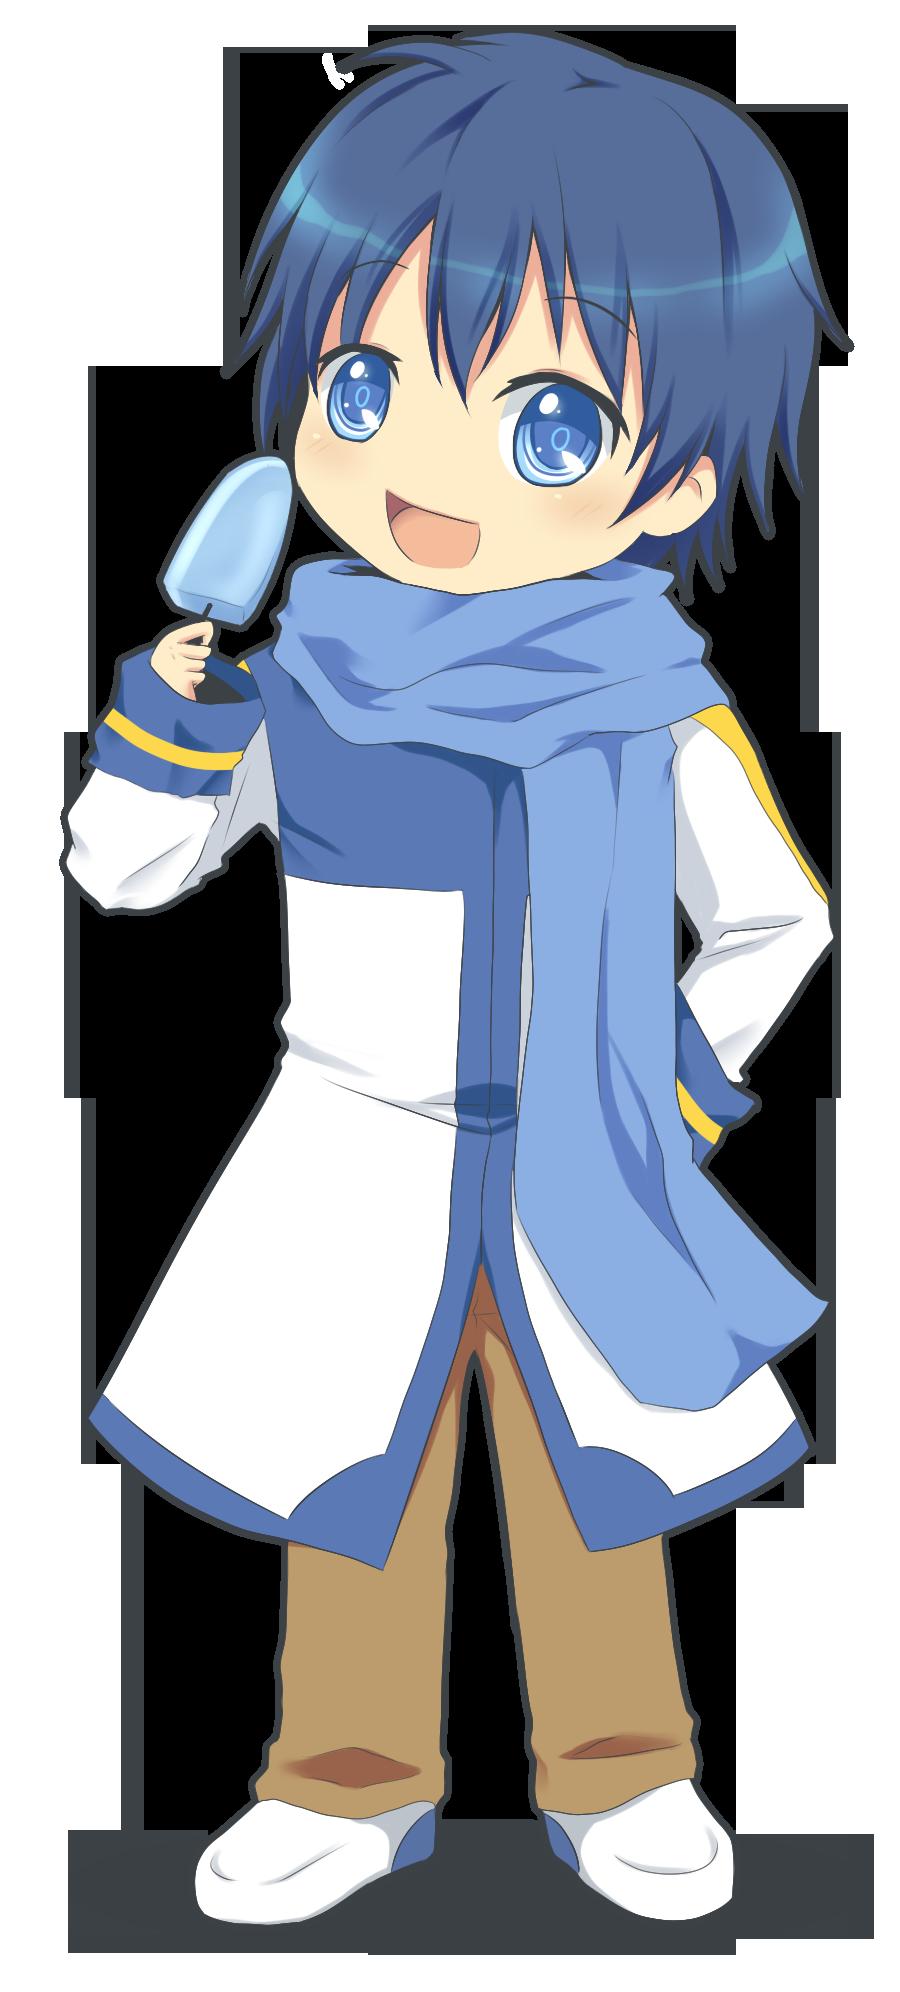 Kaito (Vocaloid) -Tana- Minecraft Skin  Kaito (Vocaloid...